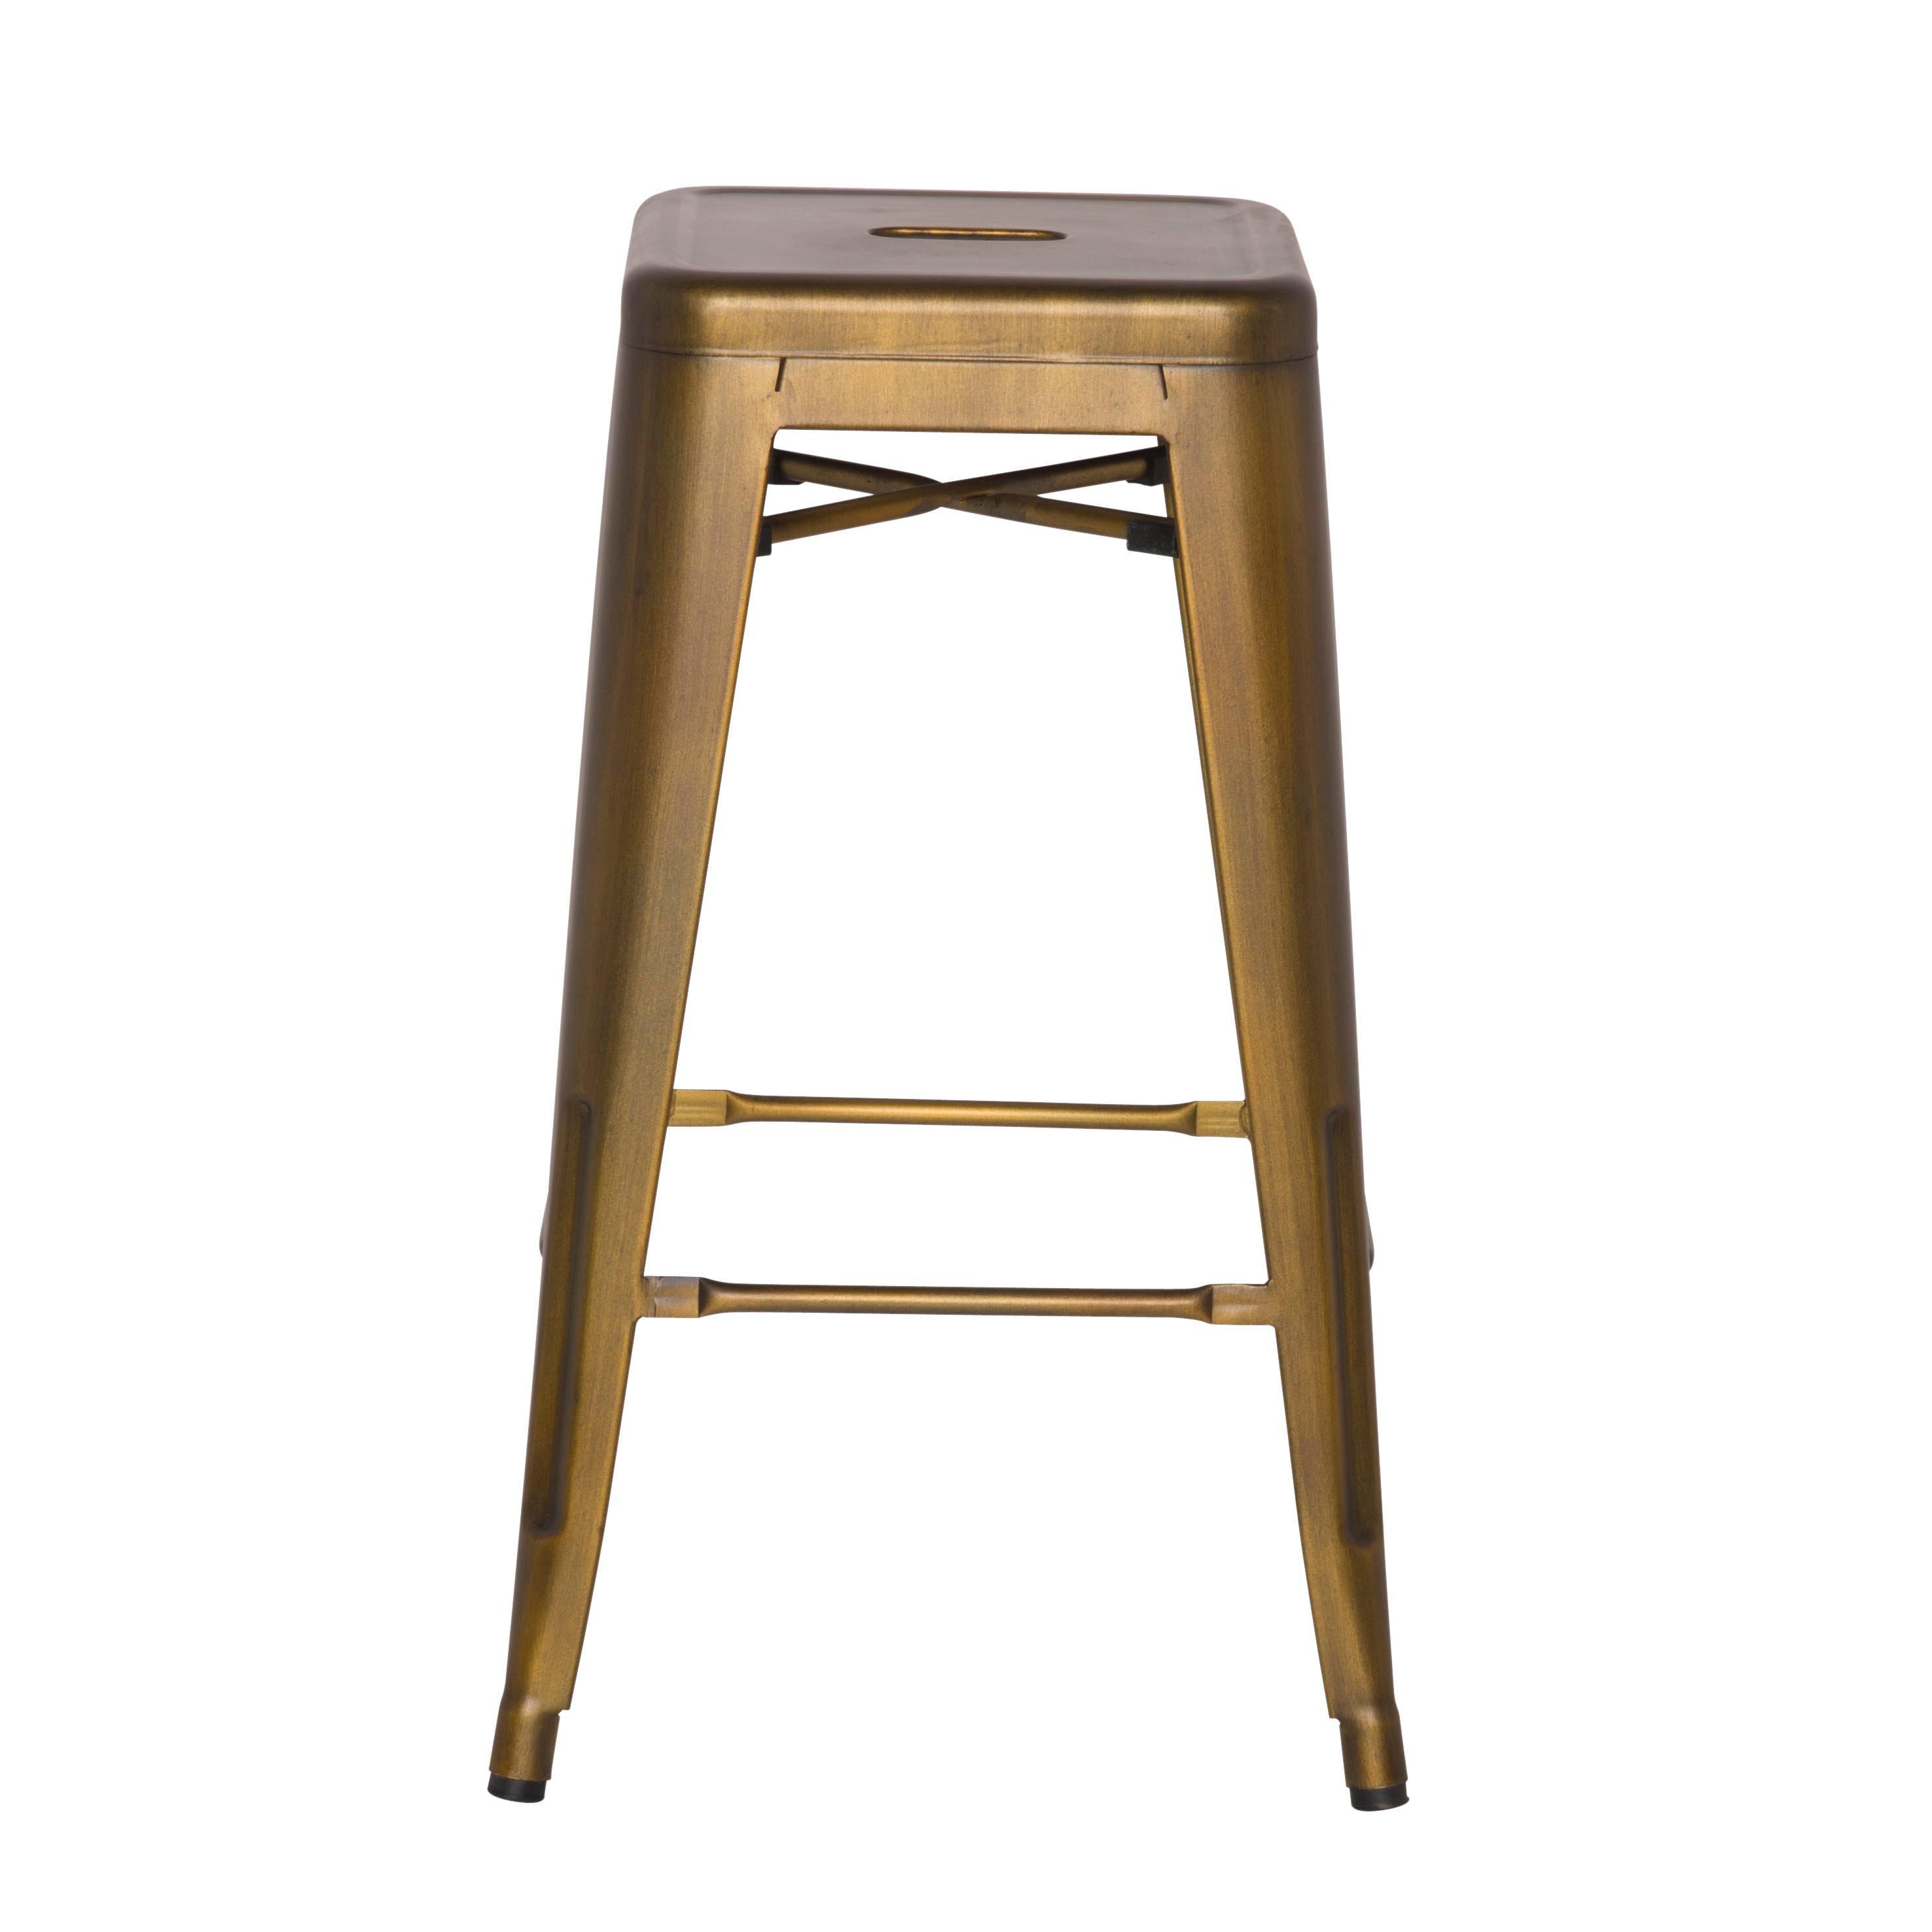 Awe Inspiring Metropolis Metal Backless Bar Stool Brushed Copper Creativecarmelina Interior Chair Design Creativecarmelinacom